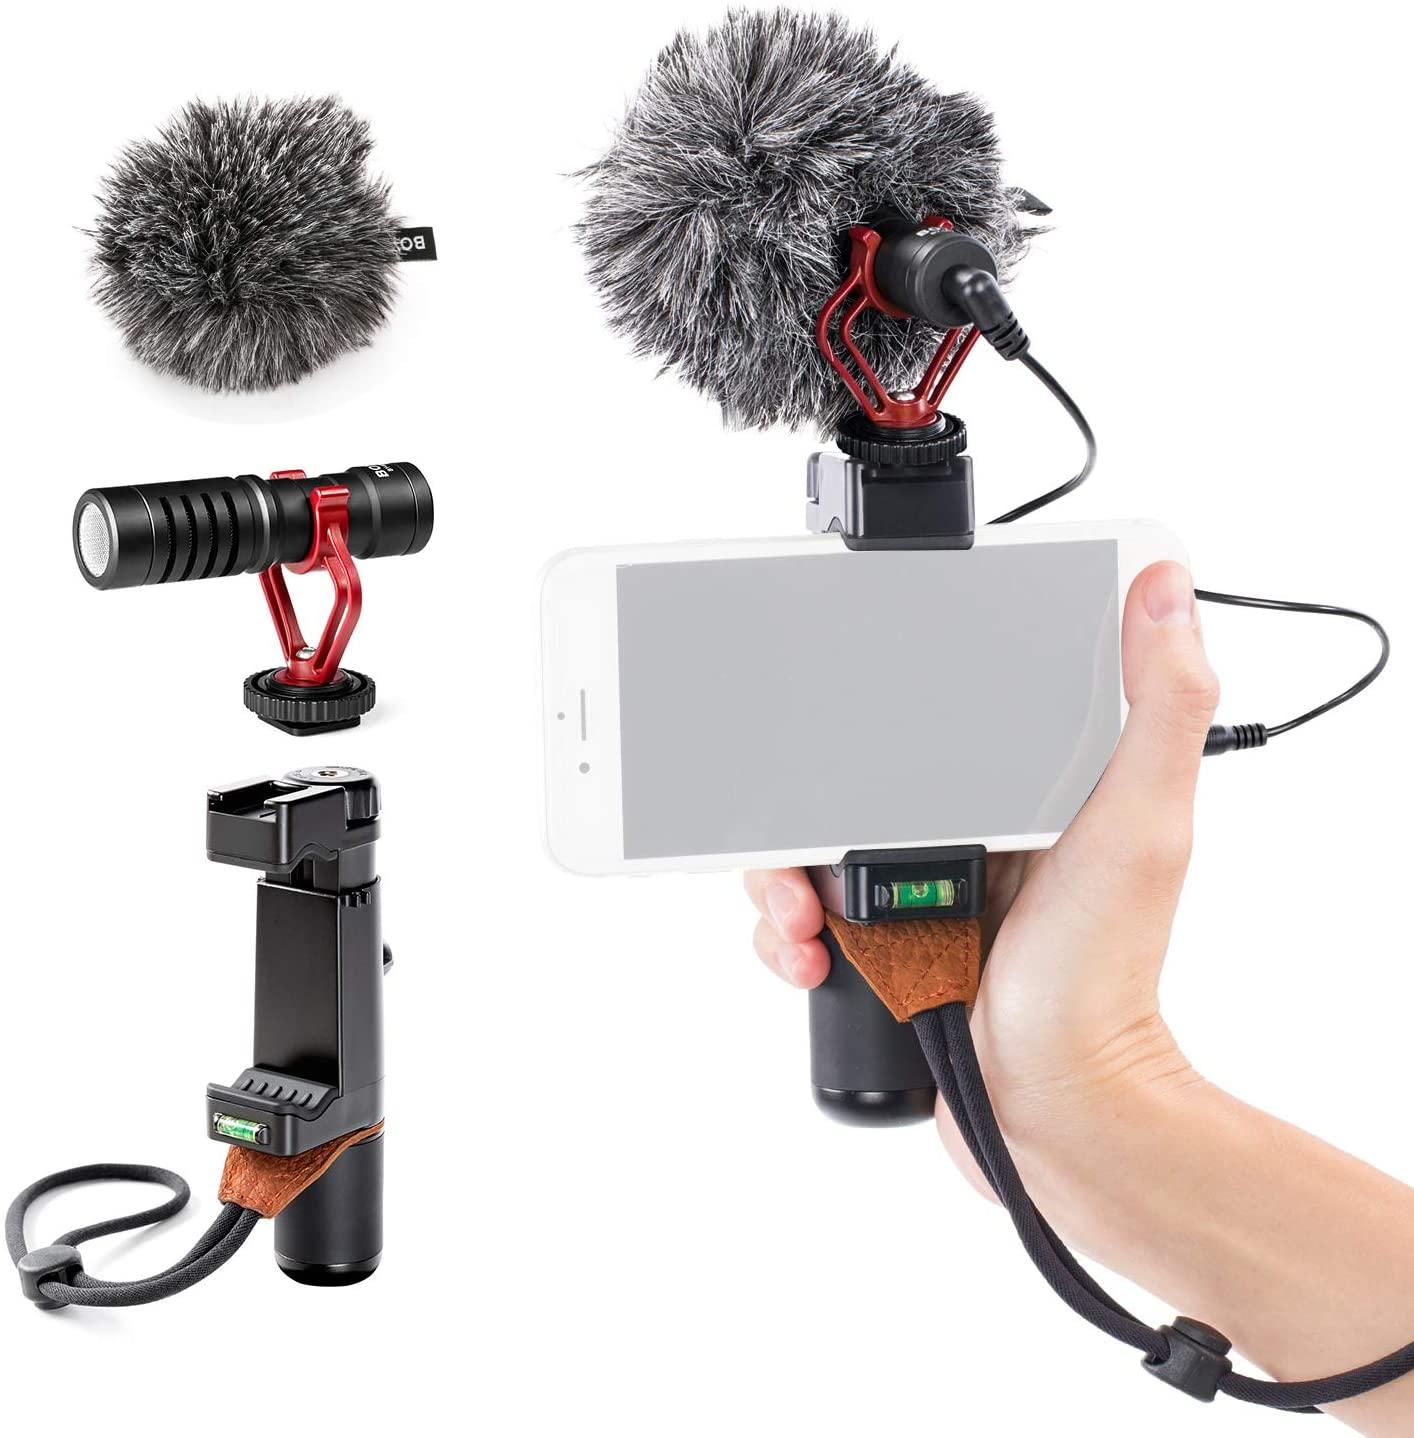 BOYA by-MM1 Shotgun Microphone with SK-PSC1 SmartGrip for Smart Phones+L._AC_SL1500_